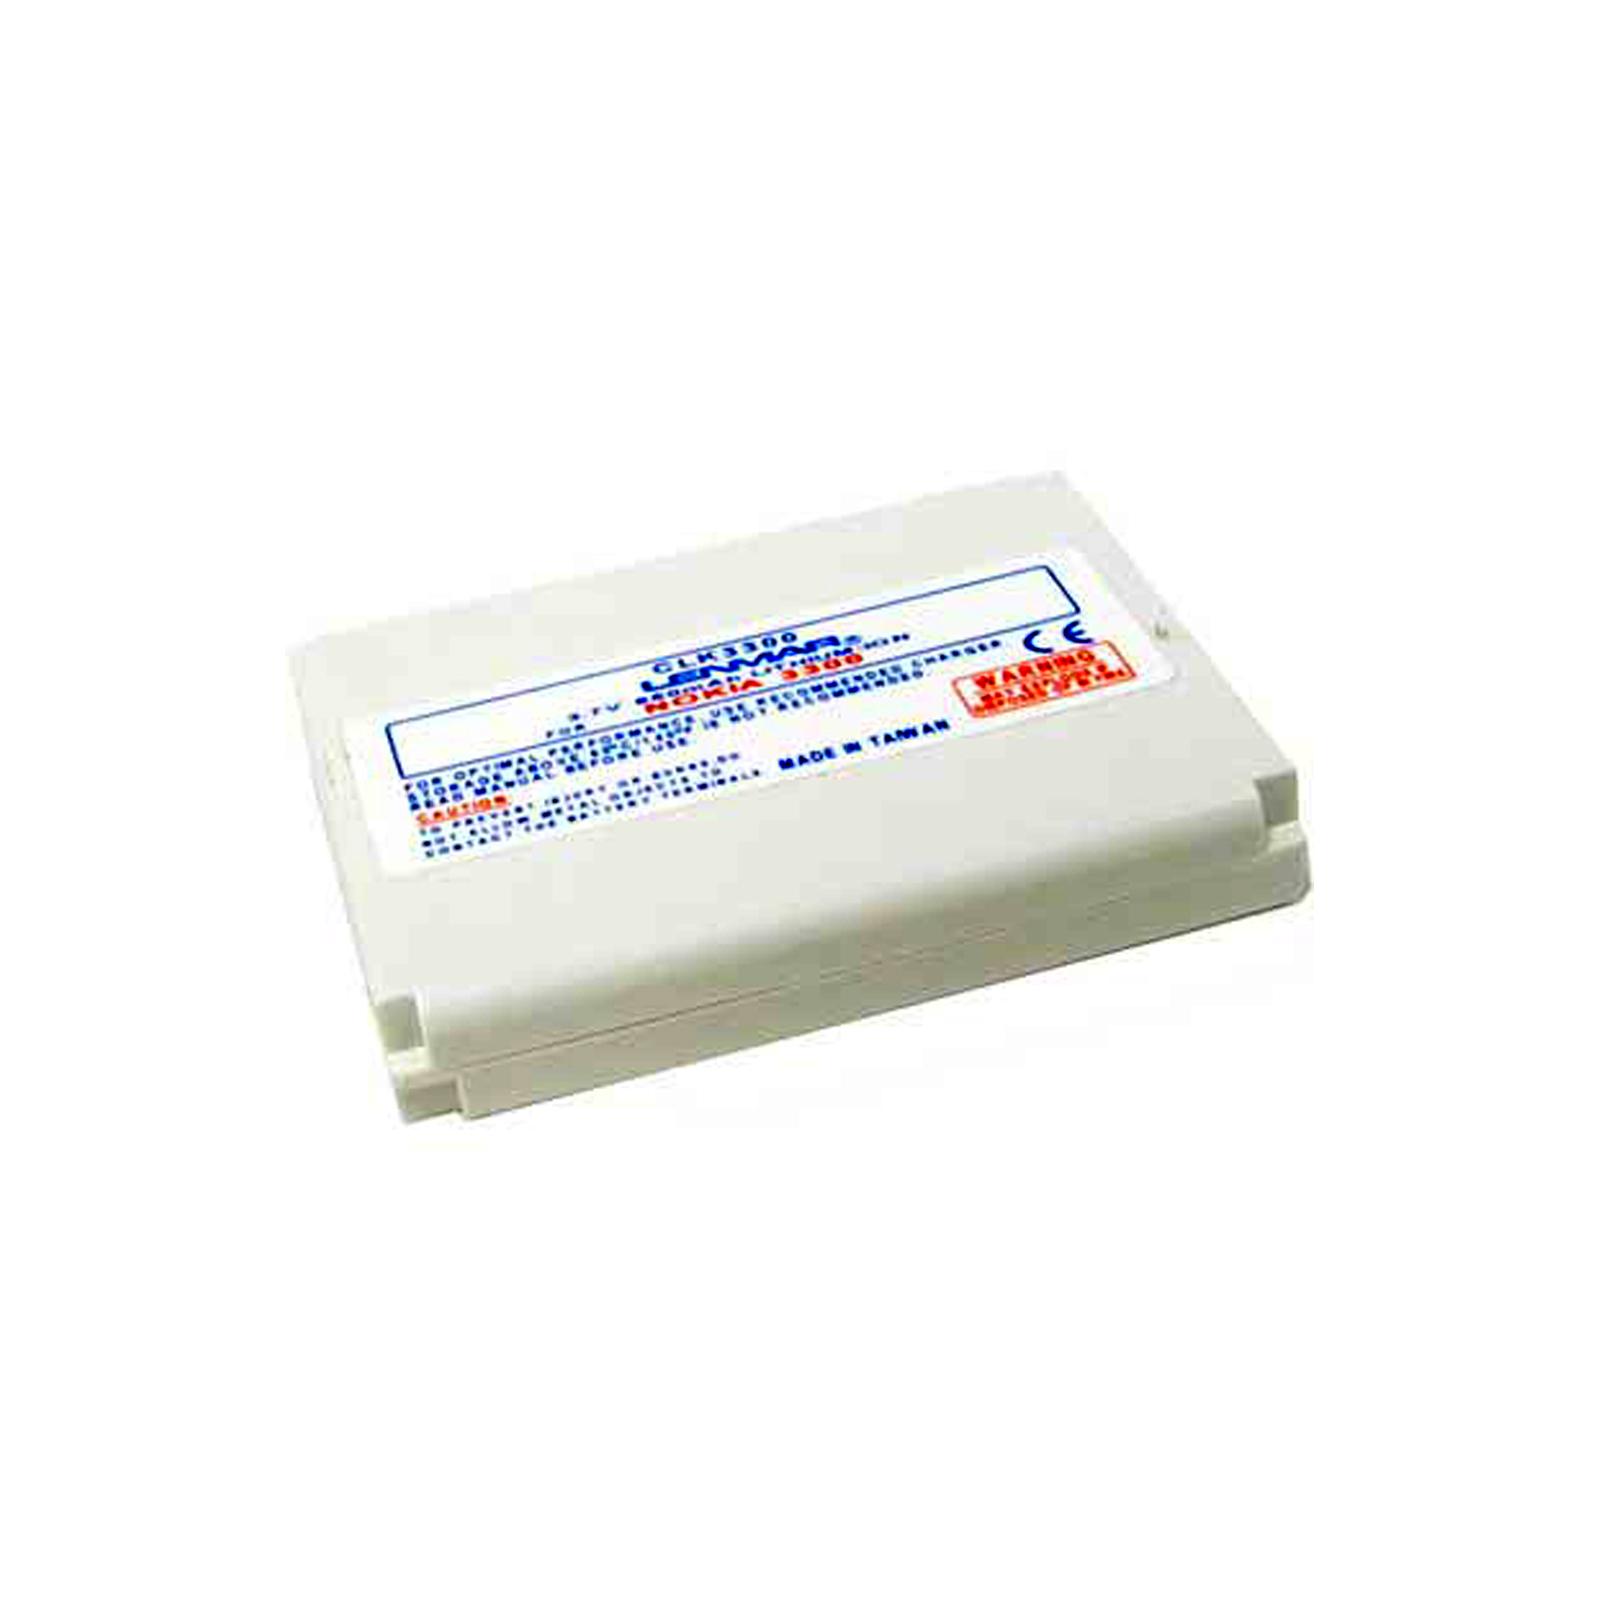 Cell phone batteries las vegas